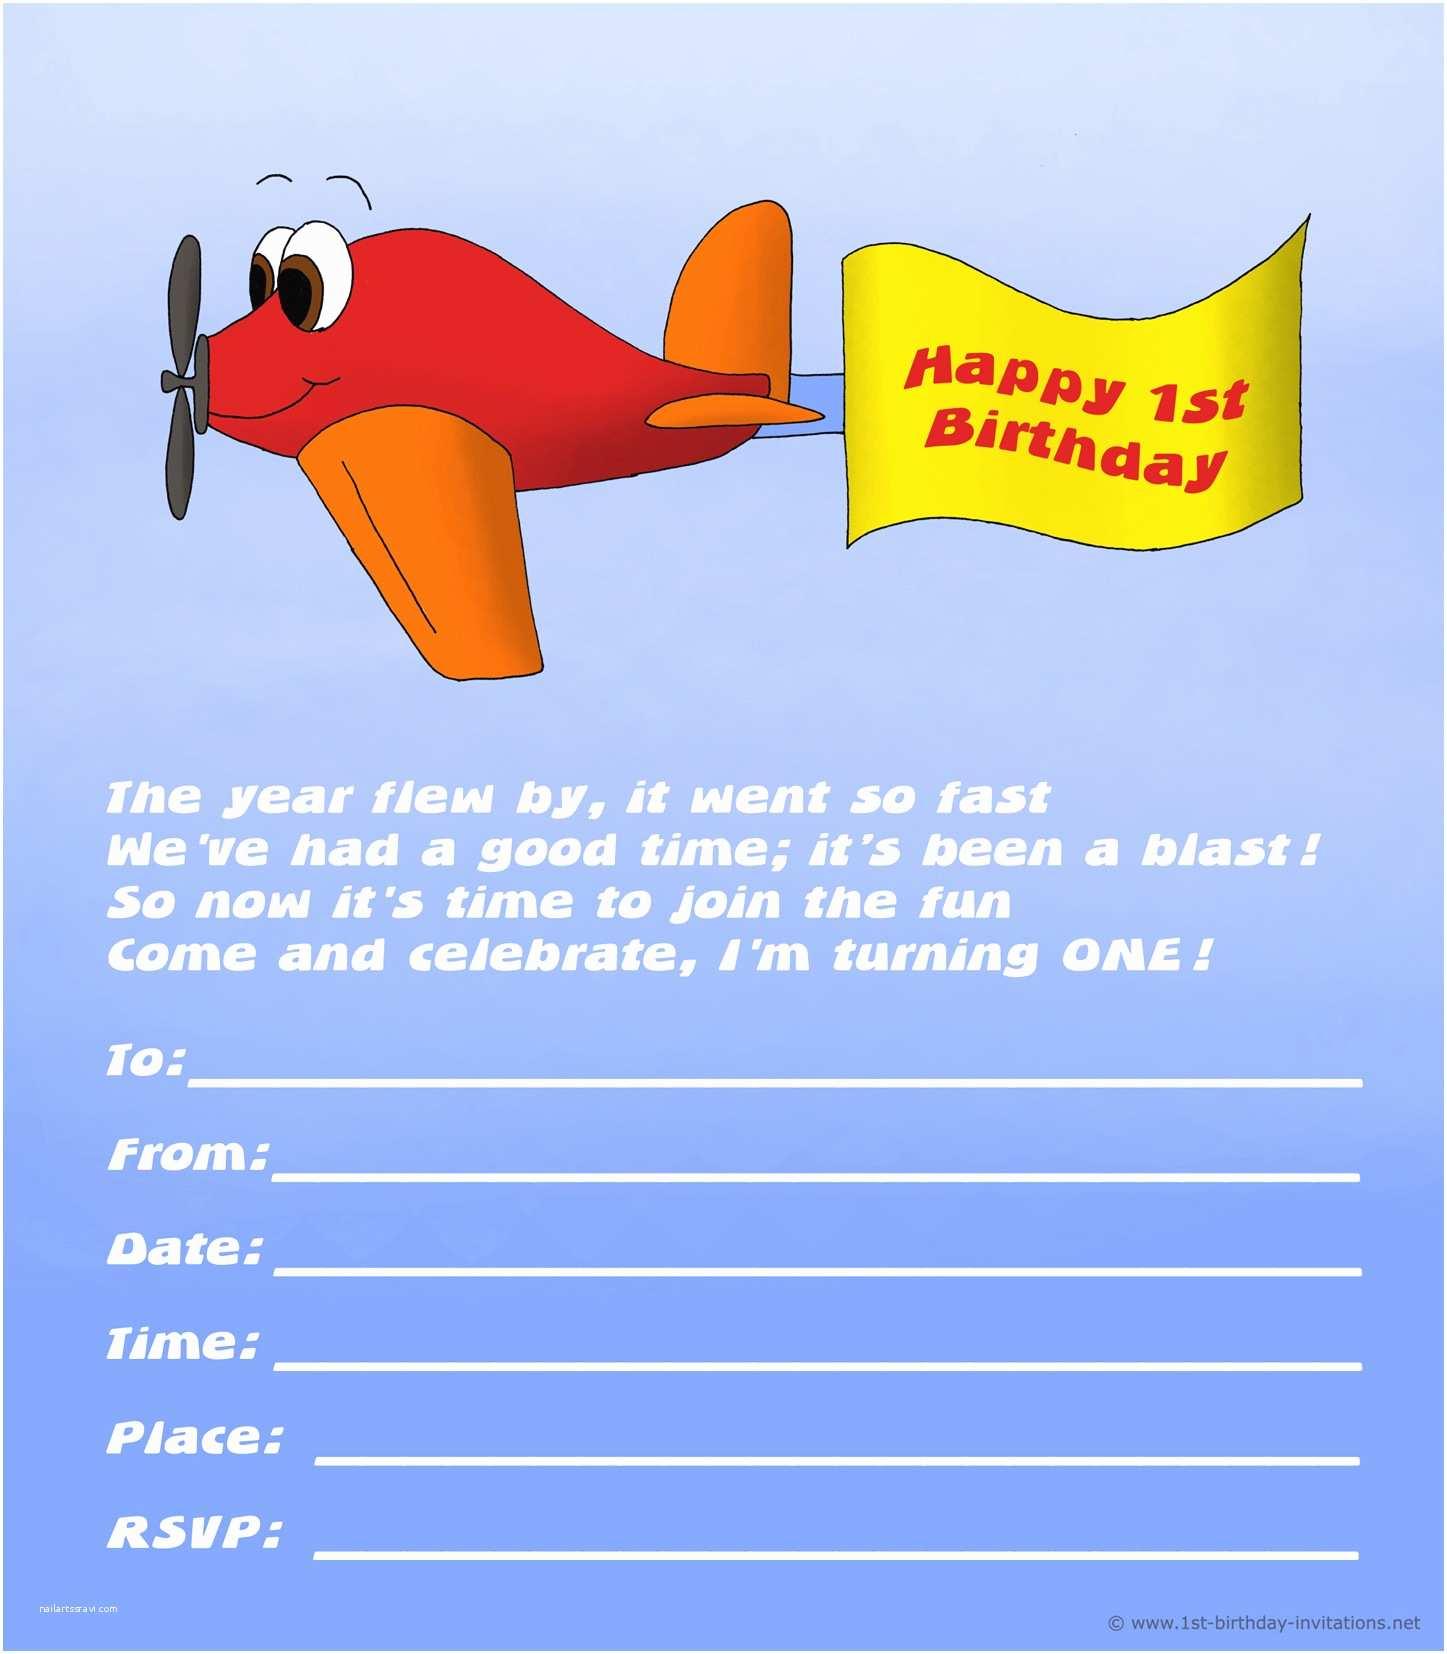 Airplane Birthday Invitations 20 Cute 1st Birthday Invitations Free Printable and